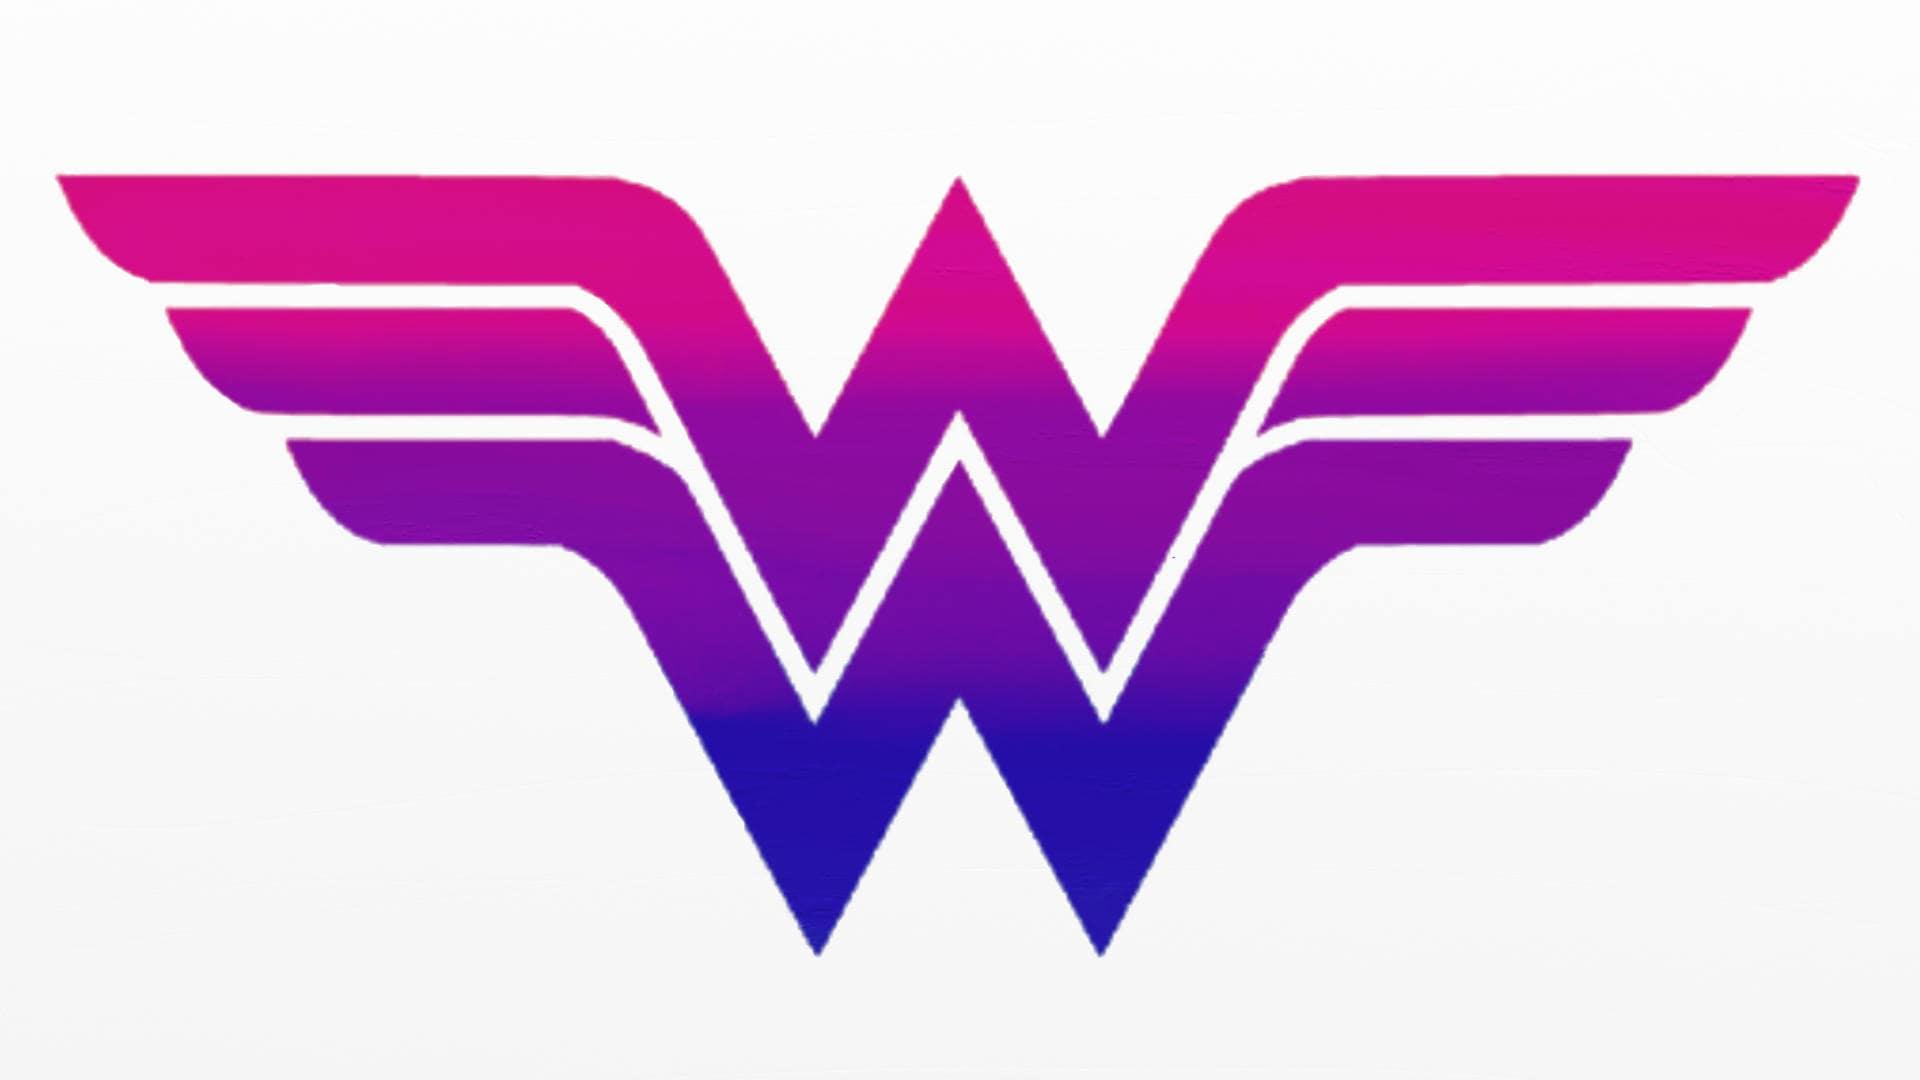 Bisexual Wonder Woman Graphic Design Use As Desktop Etsy